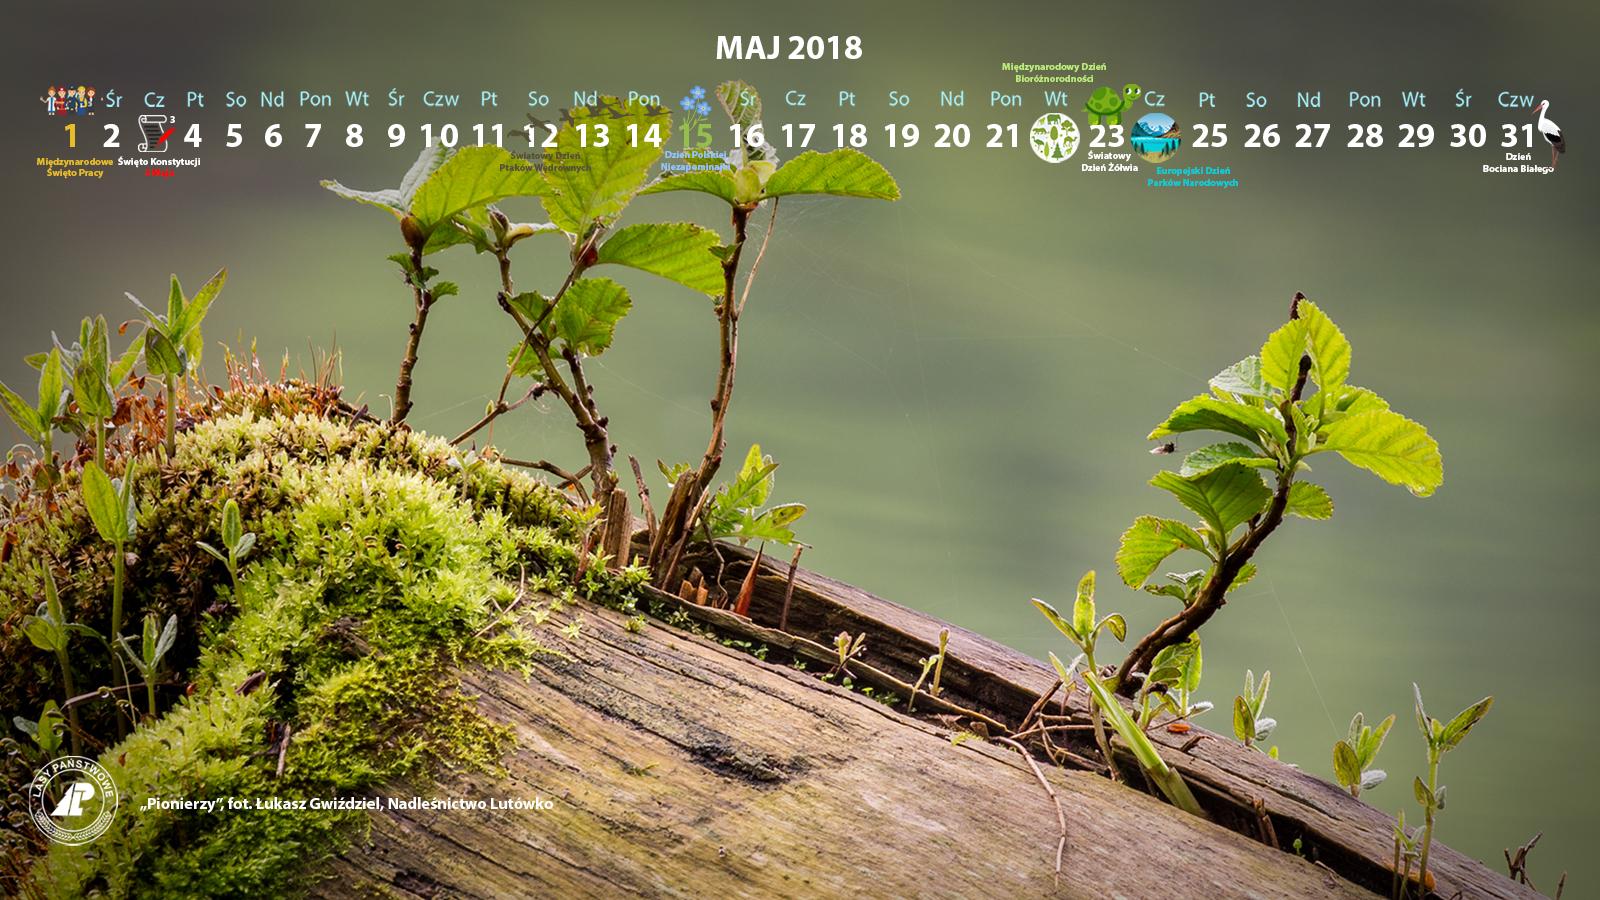 Kalendarz maj 2018 1600x900.jpg